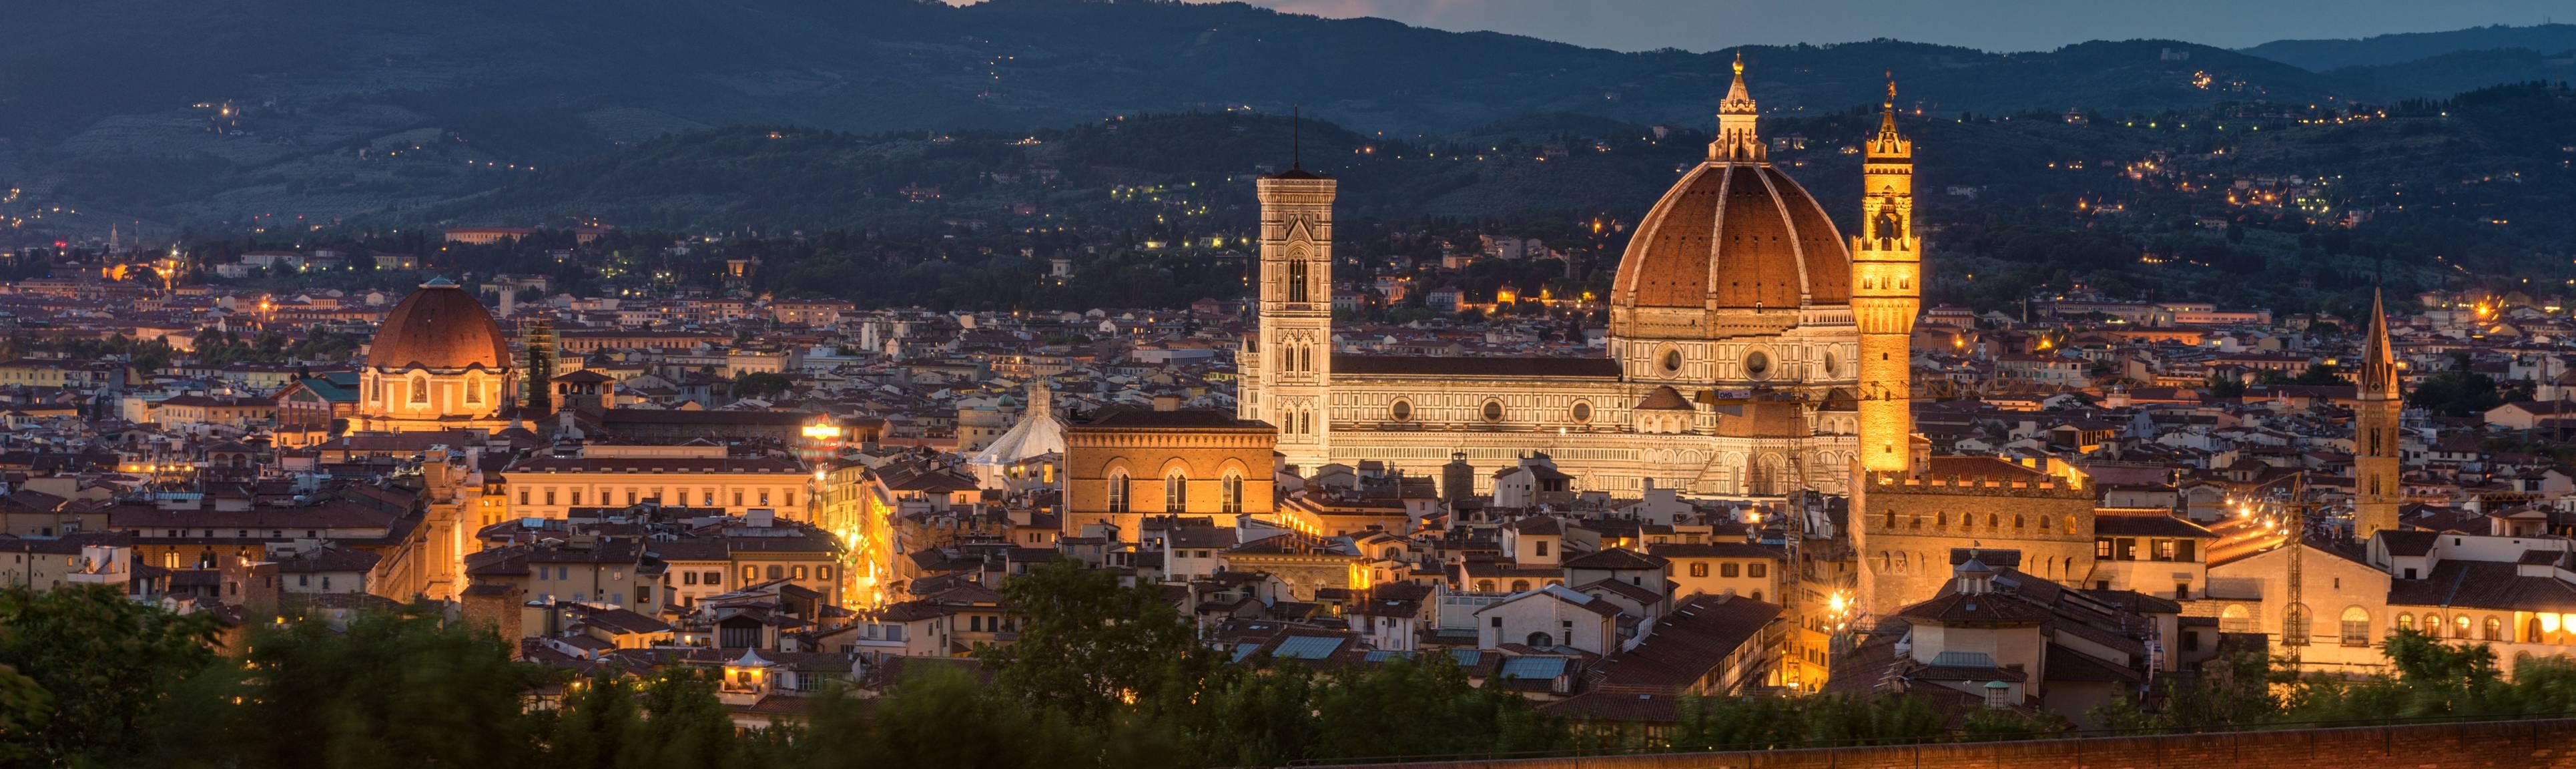 The city of Florence illuminated at night